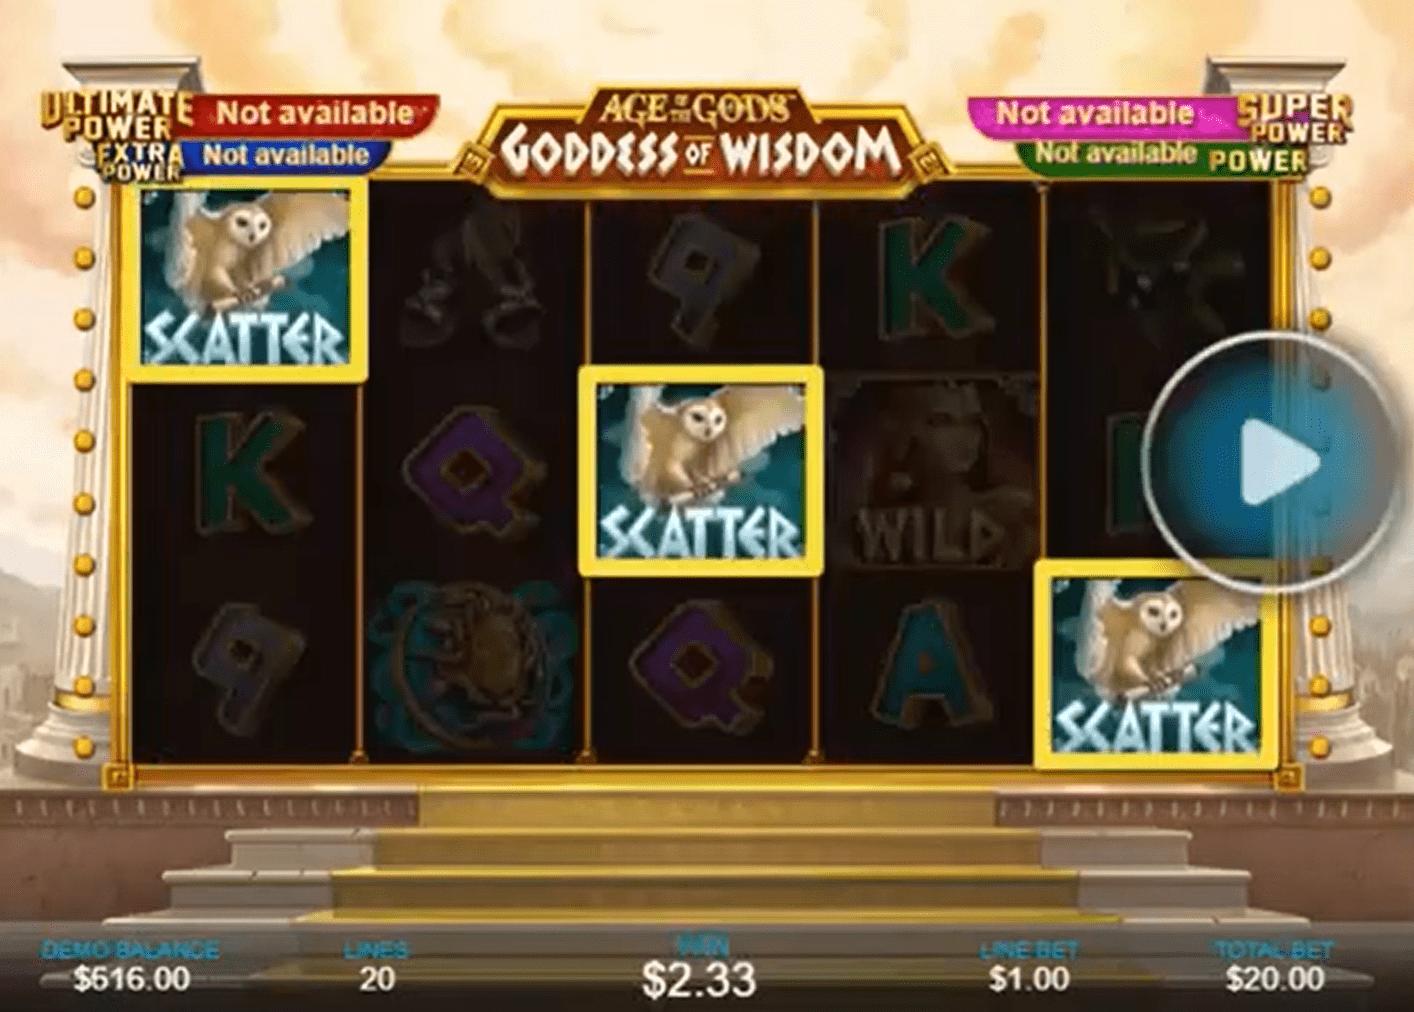 Age of the Gods Goddess of Wisdom Slot Machine Paylines